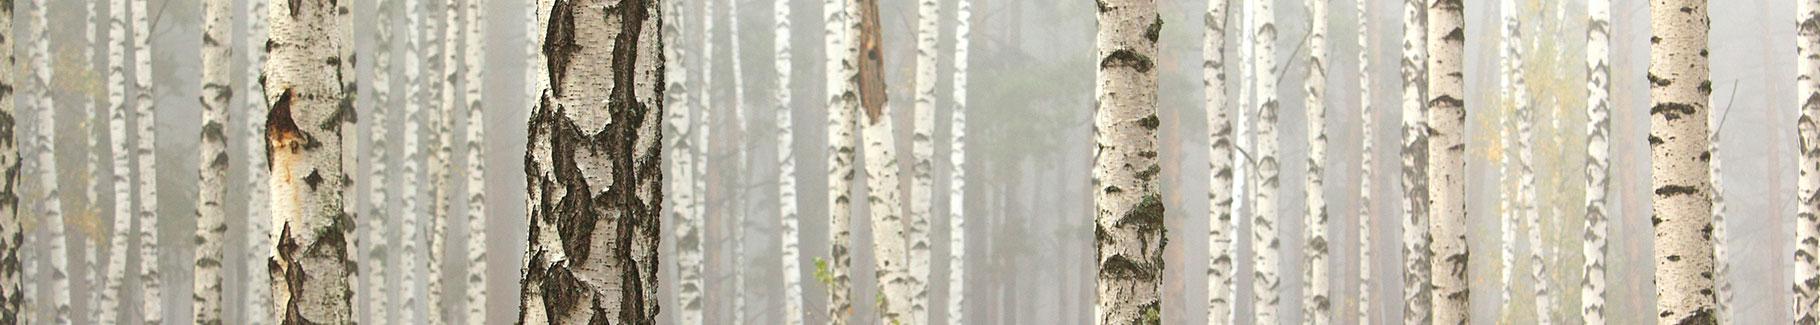 Fototapeta las liściasty